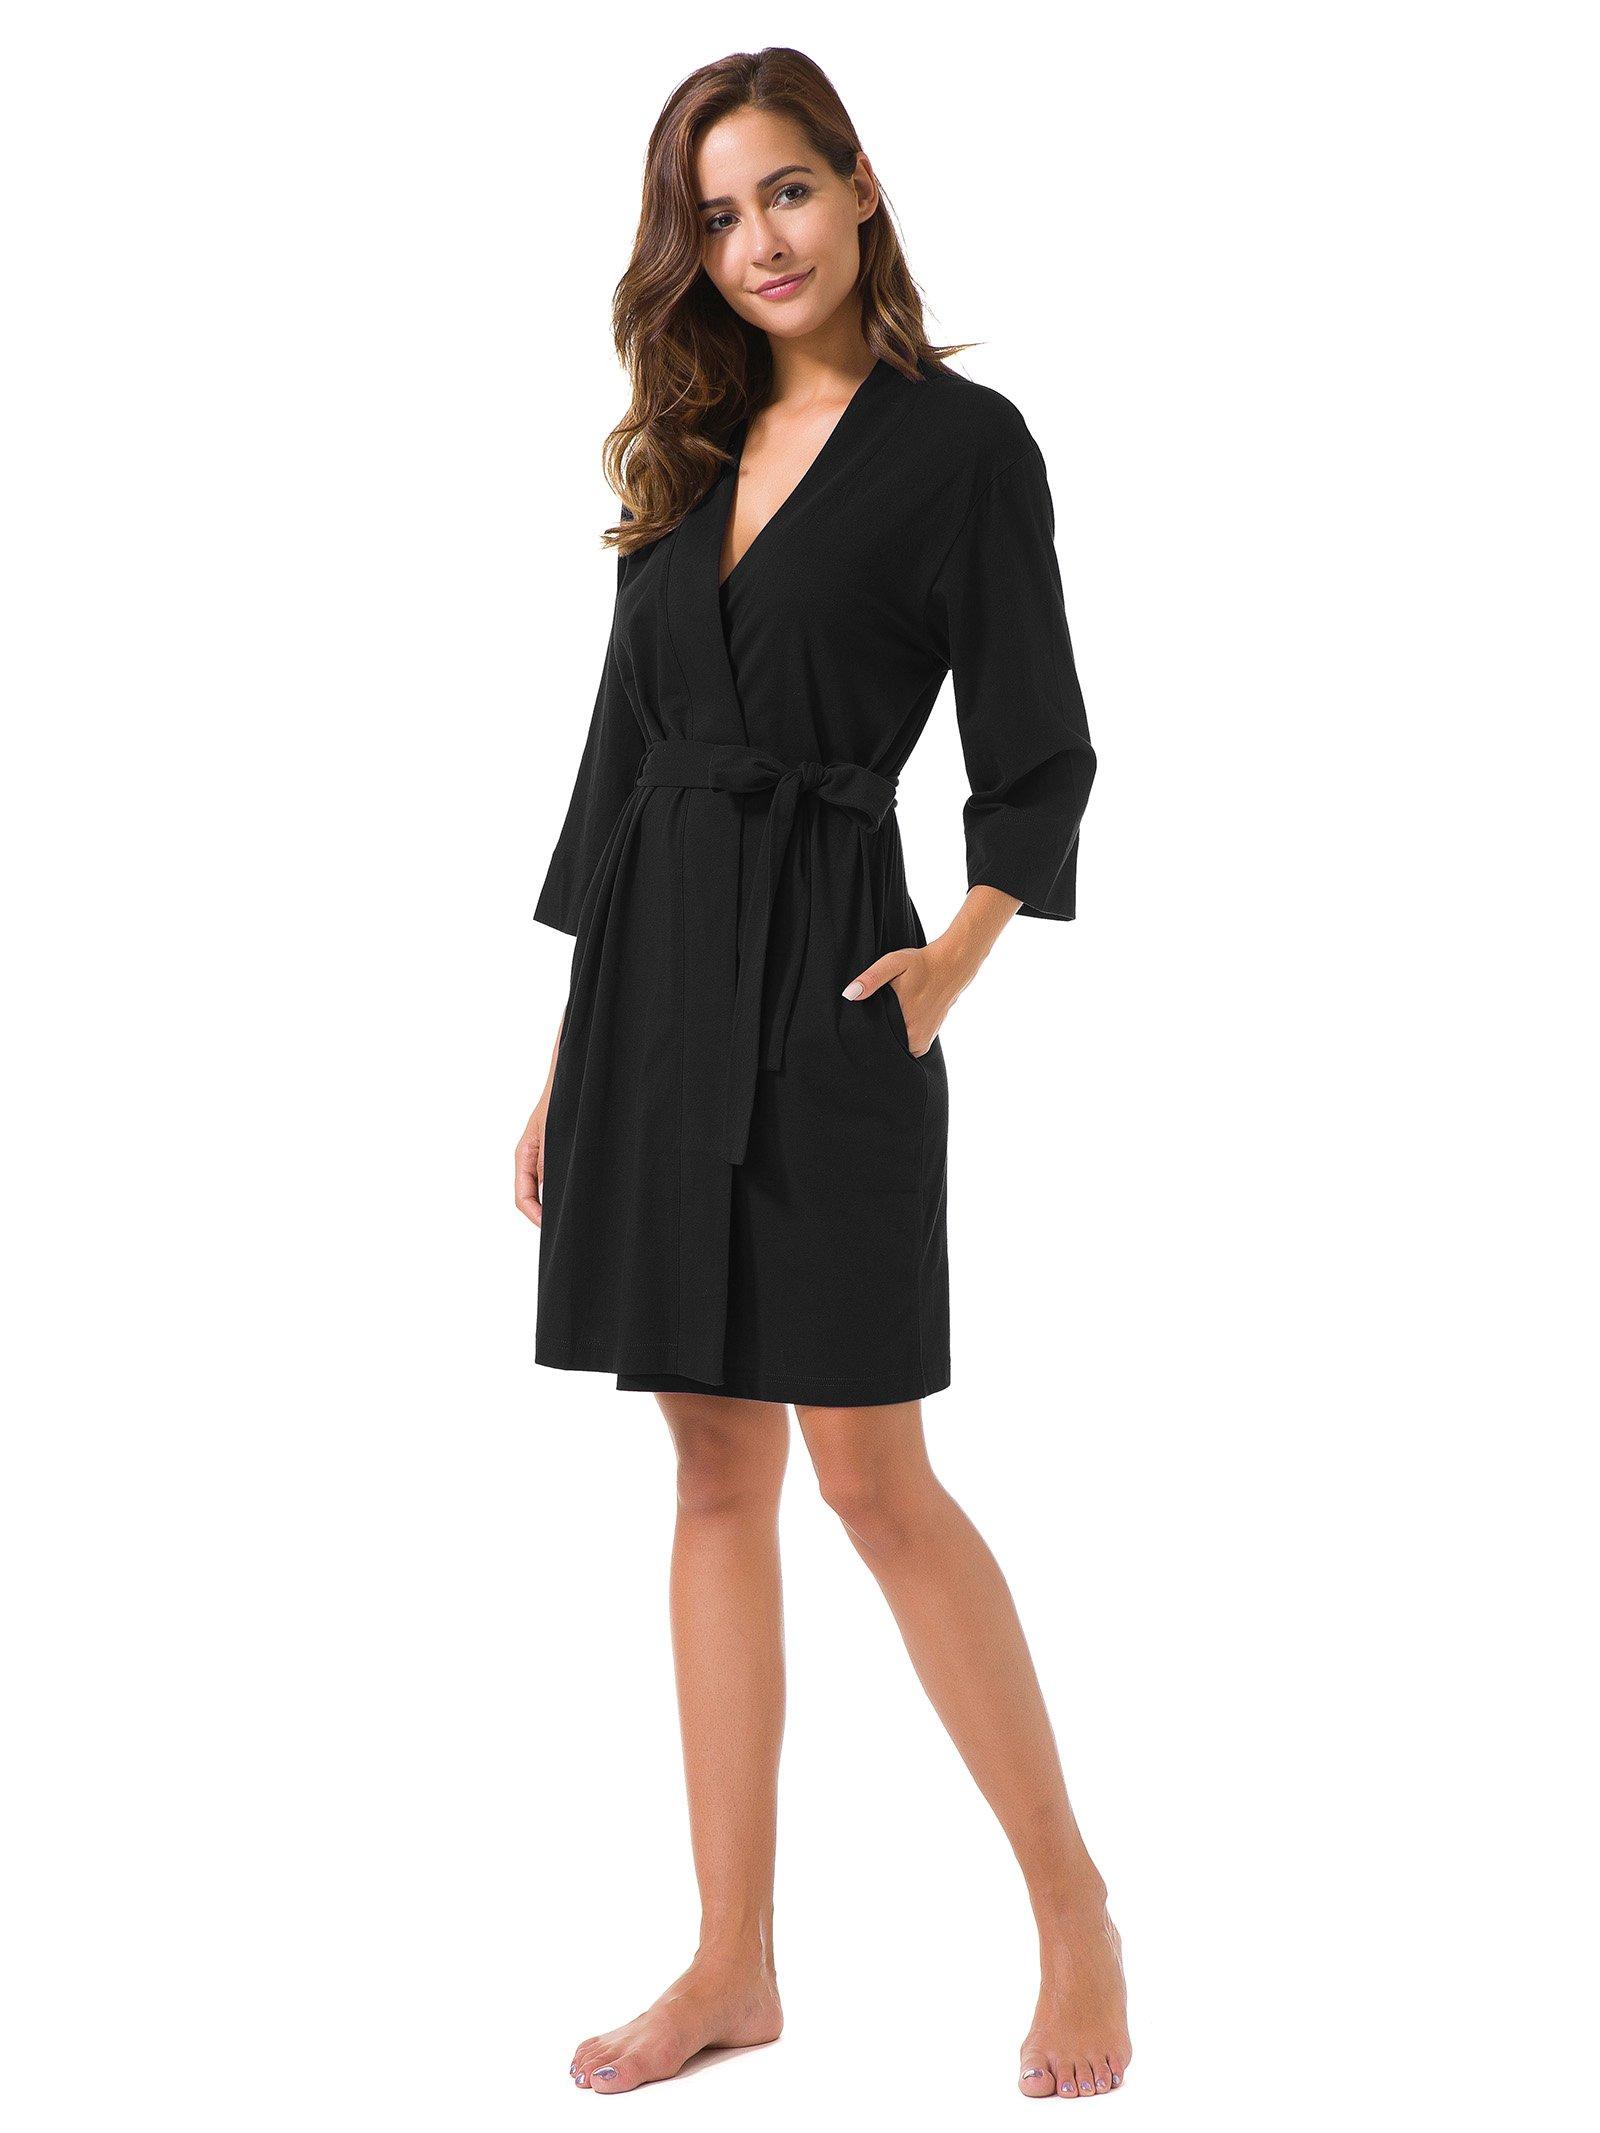 SIORO Cotton Robes Lightweight Kimono Robe Gowns Soft Knit Bathrobe Nightwear V-Neck Loungewear Sexy Sleepwear Short for Women, Black, S by SIORO (Image #3)